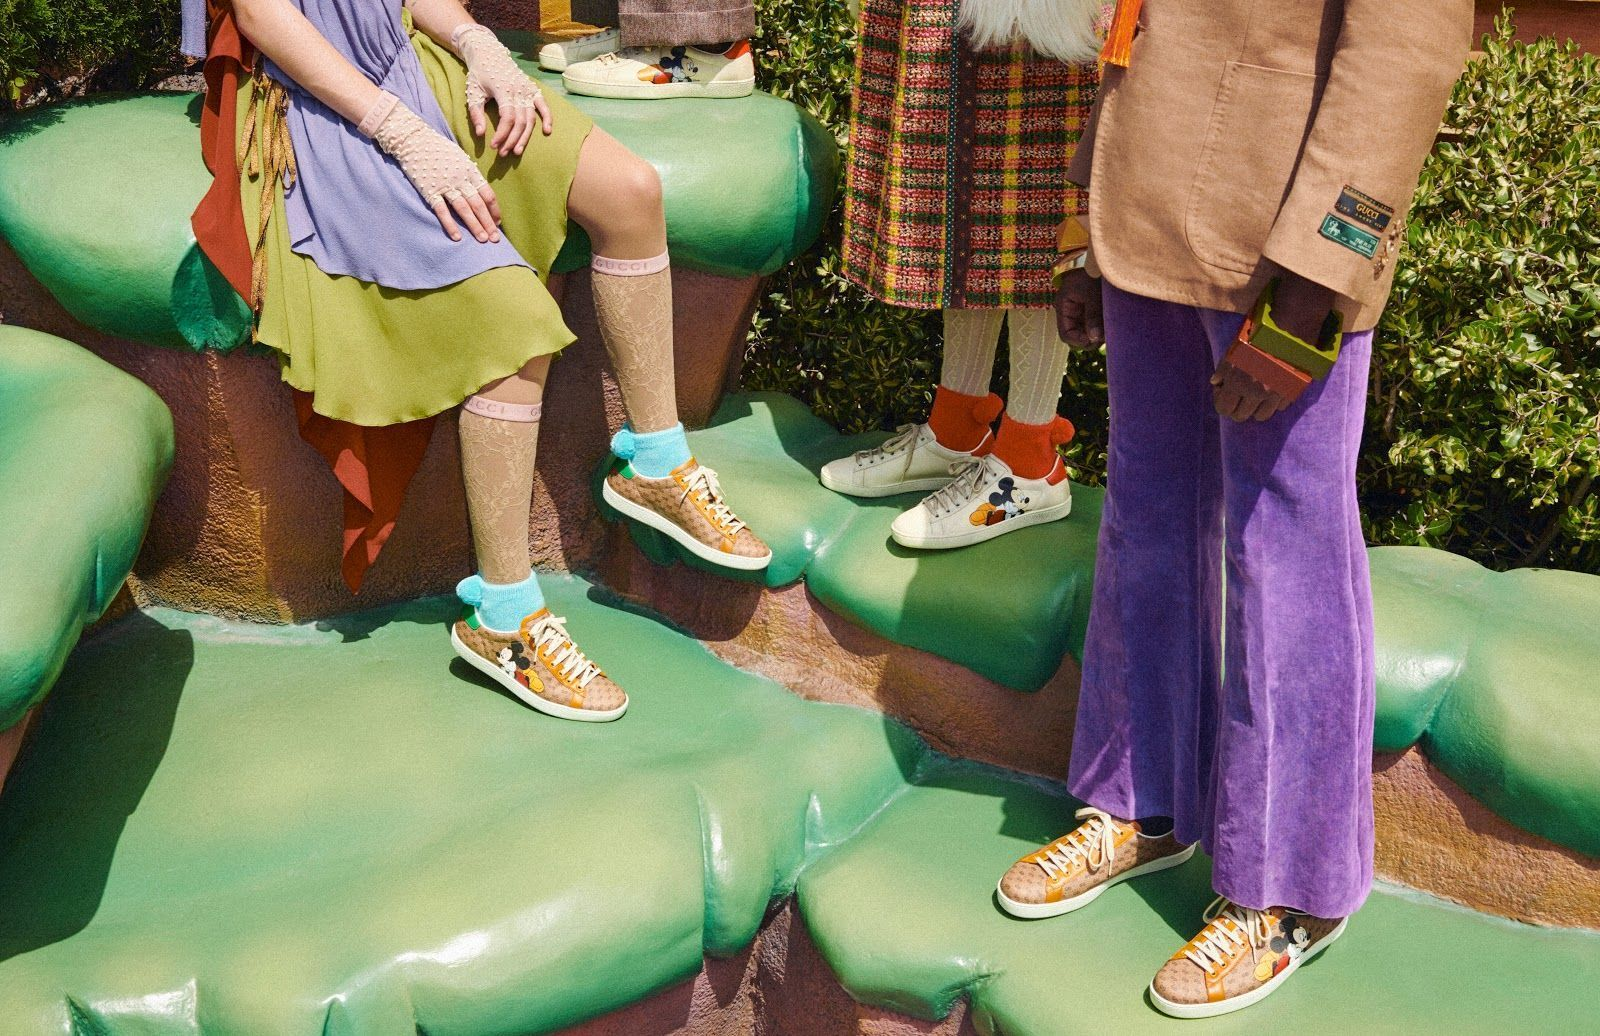 Scarpe Gucci x Disney - Neomag.